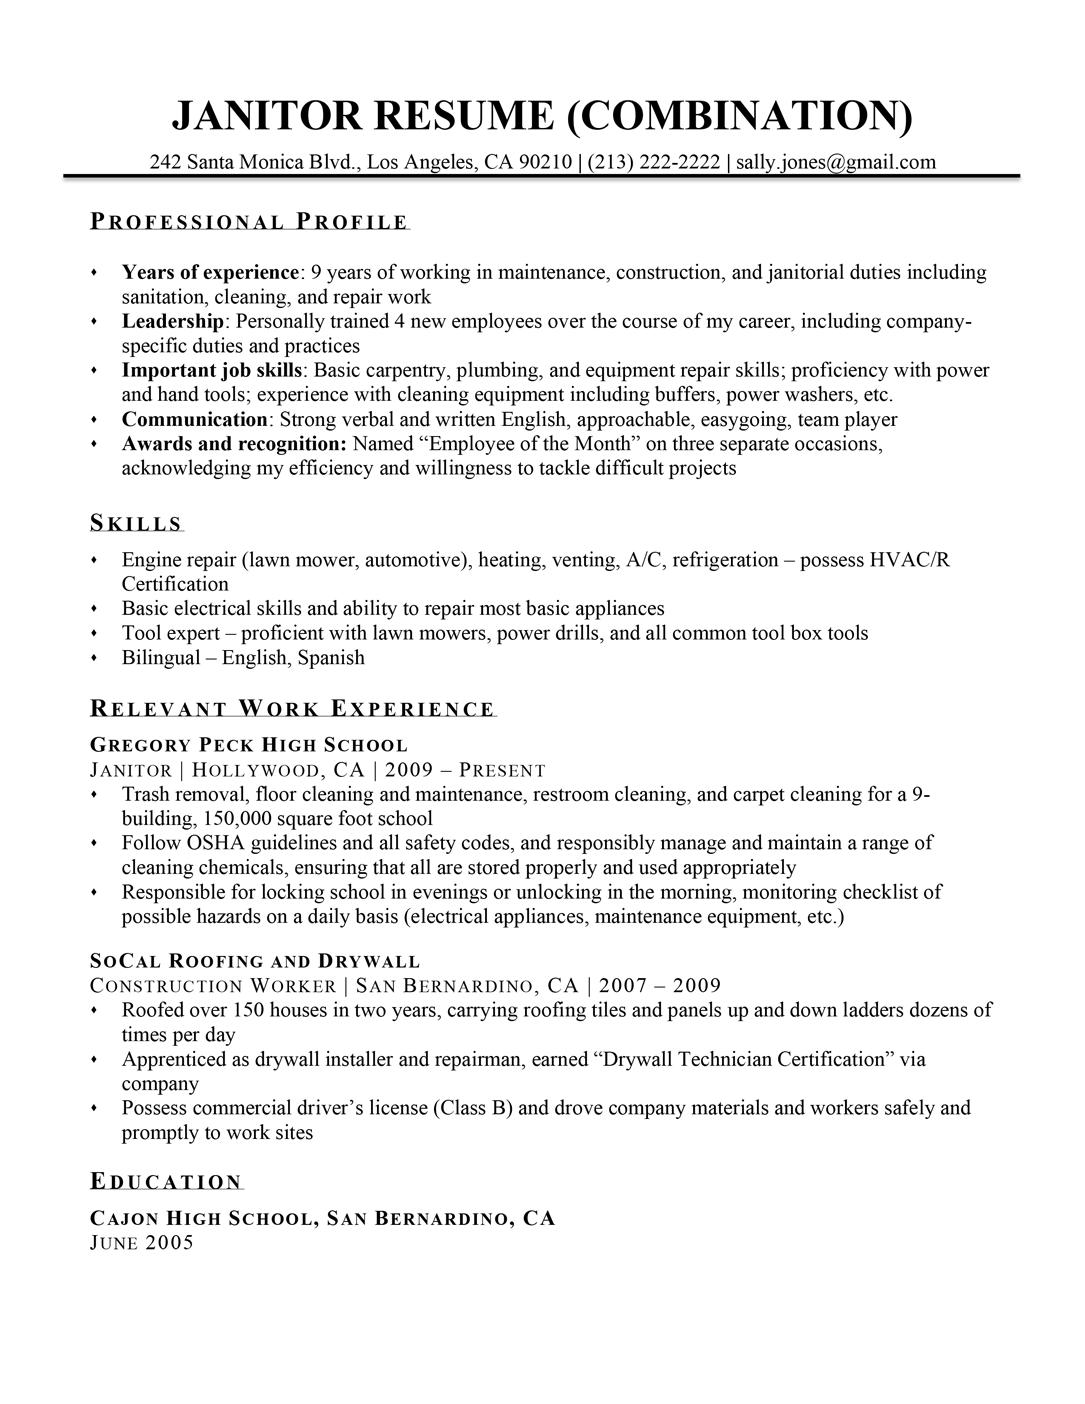 Janitor Resume Sample Resume Companion